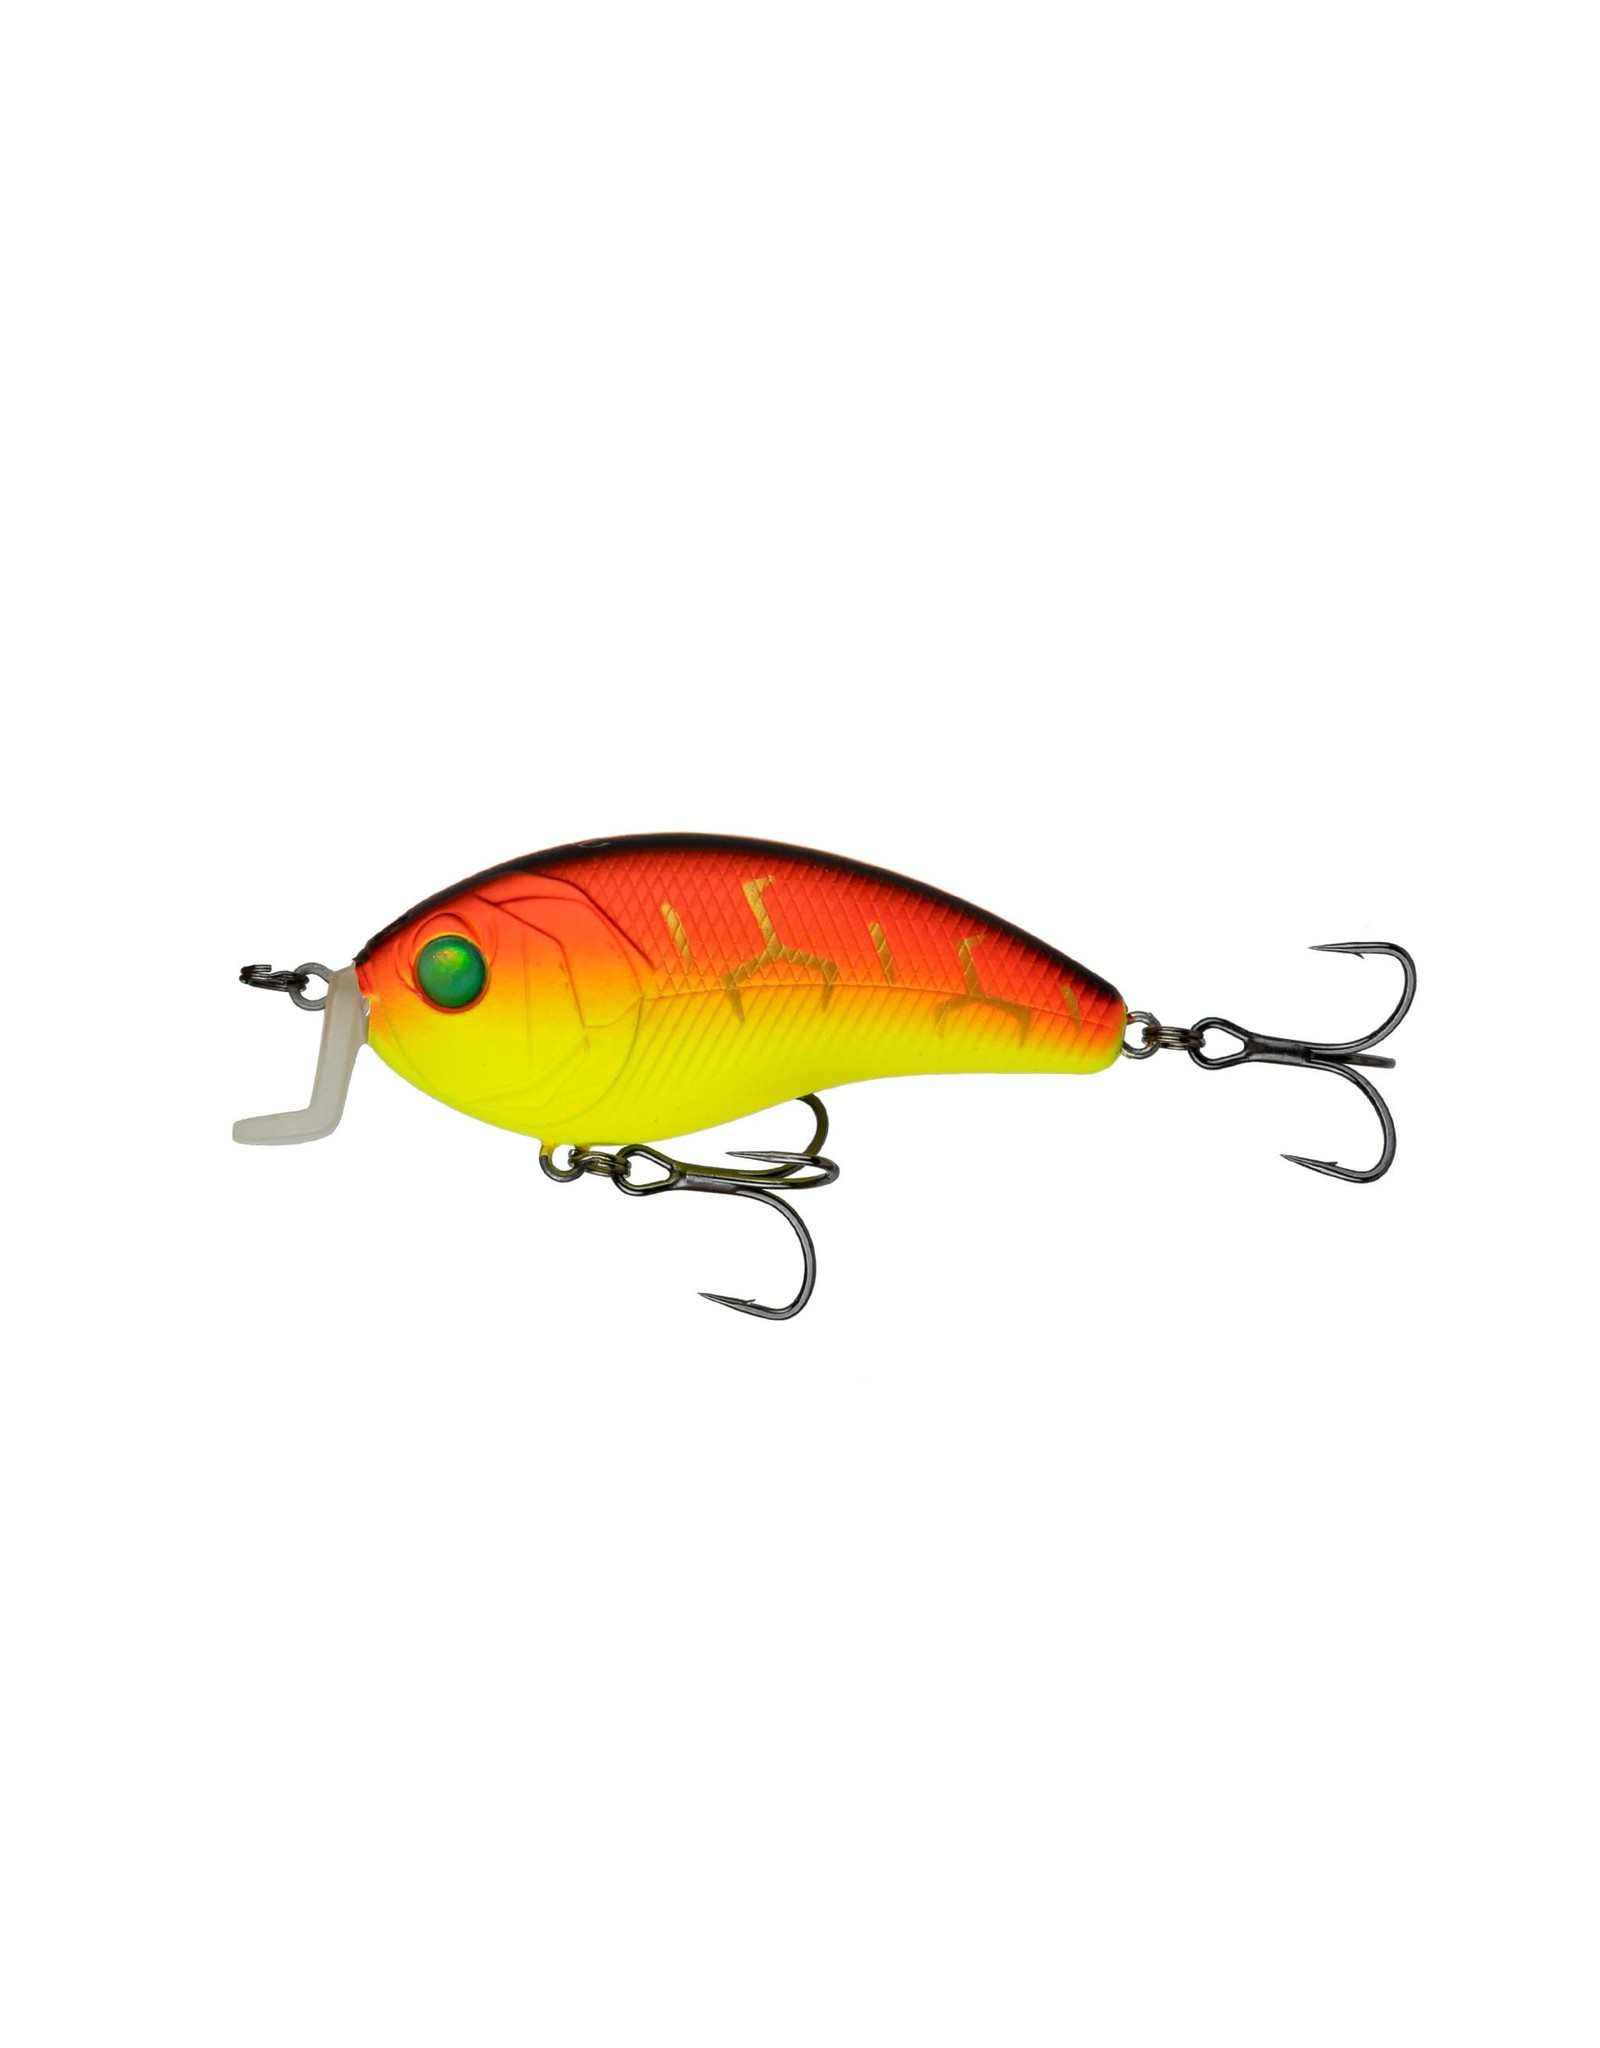 6th Sense Fishing 6th Sense Swank 77X Crankbait